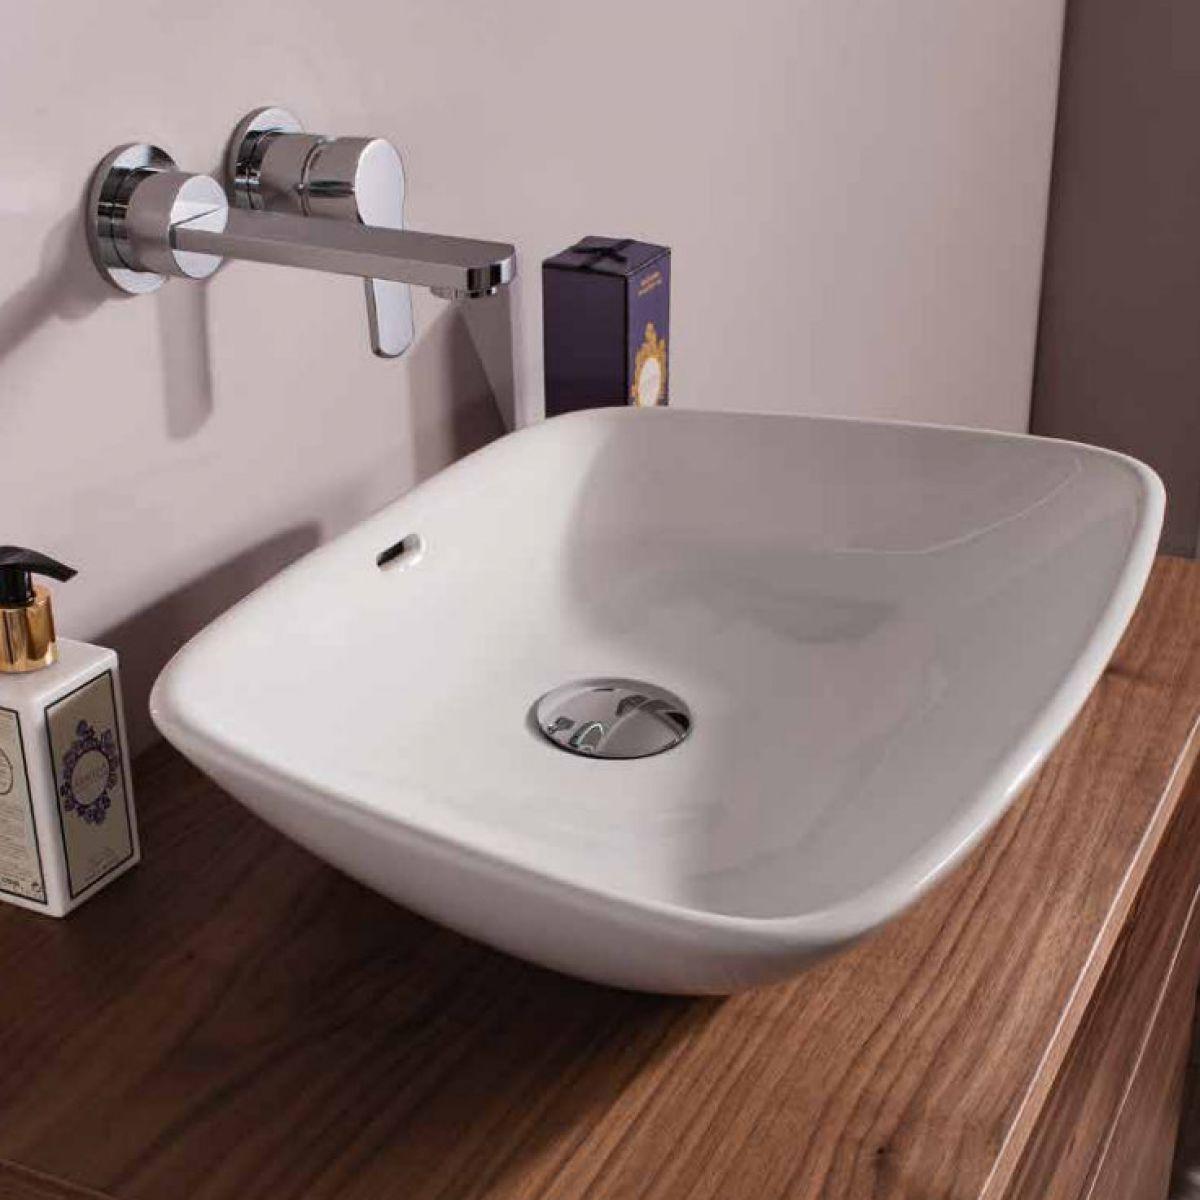 Bathroom Basin Countertop : Bauhaus Anabel Countertop Basin : UK Bathrooms